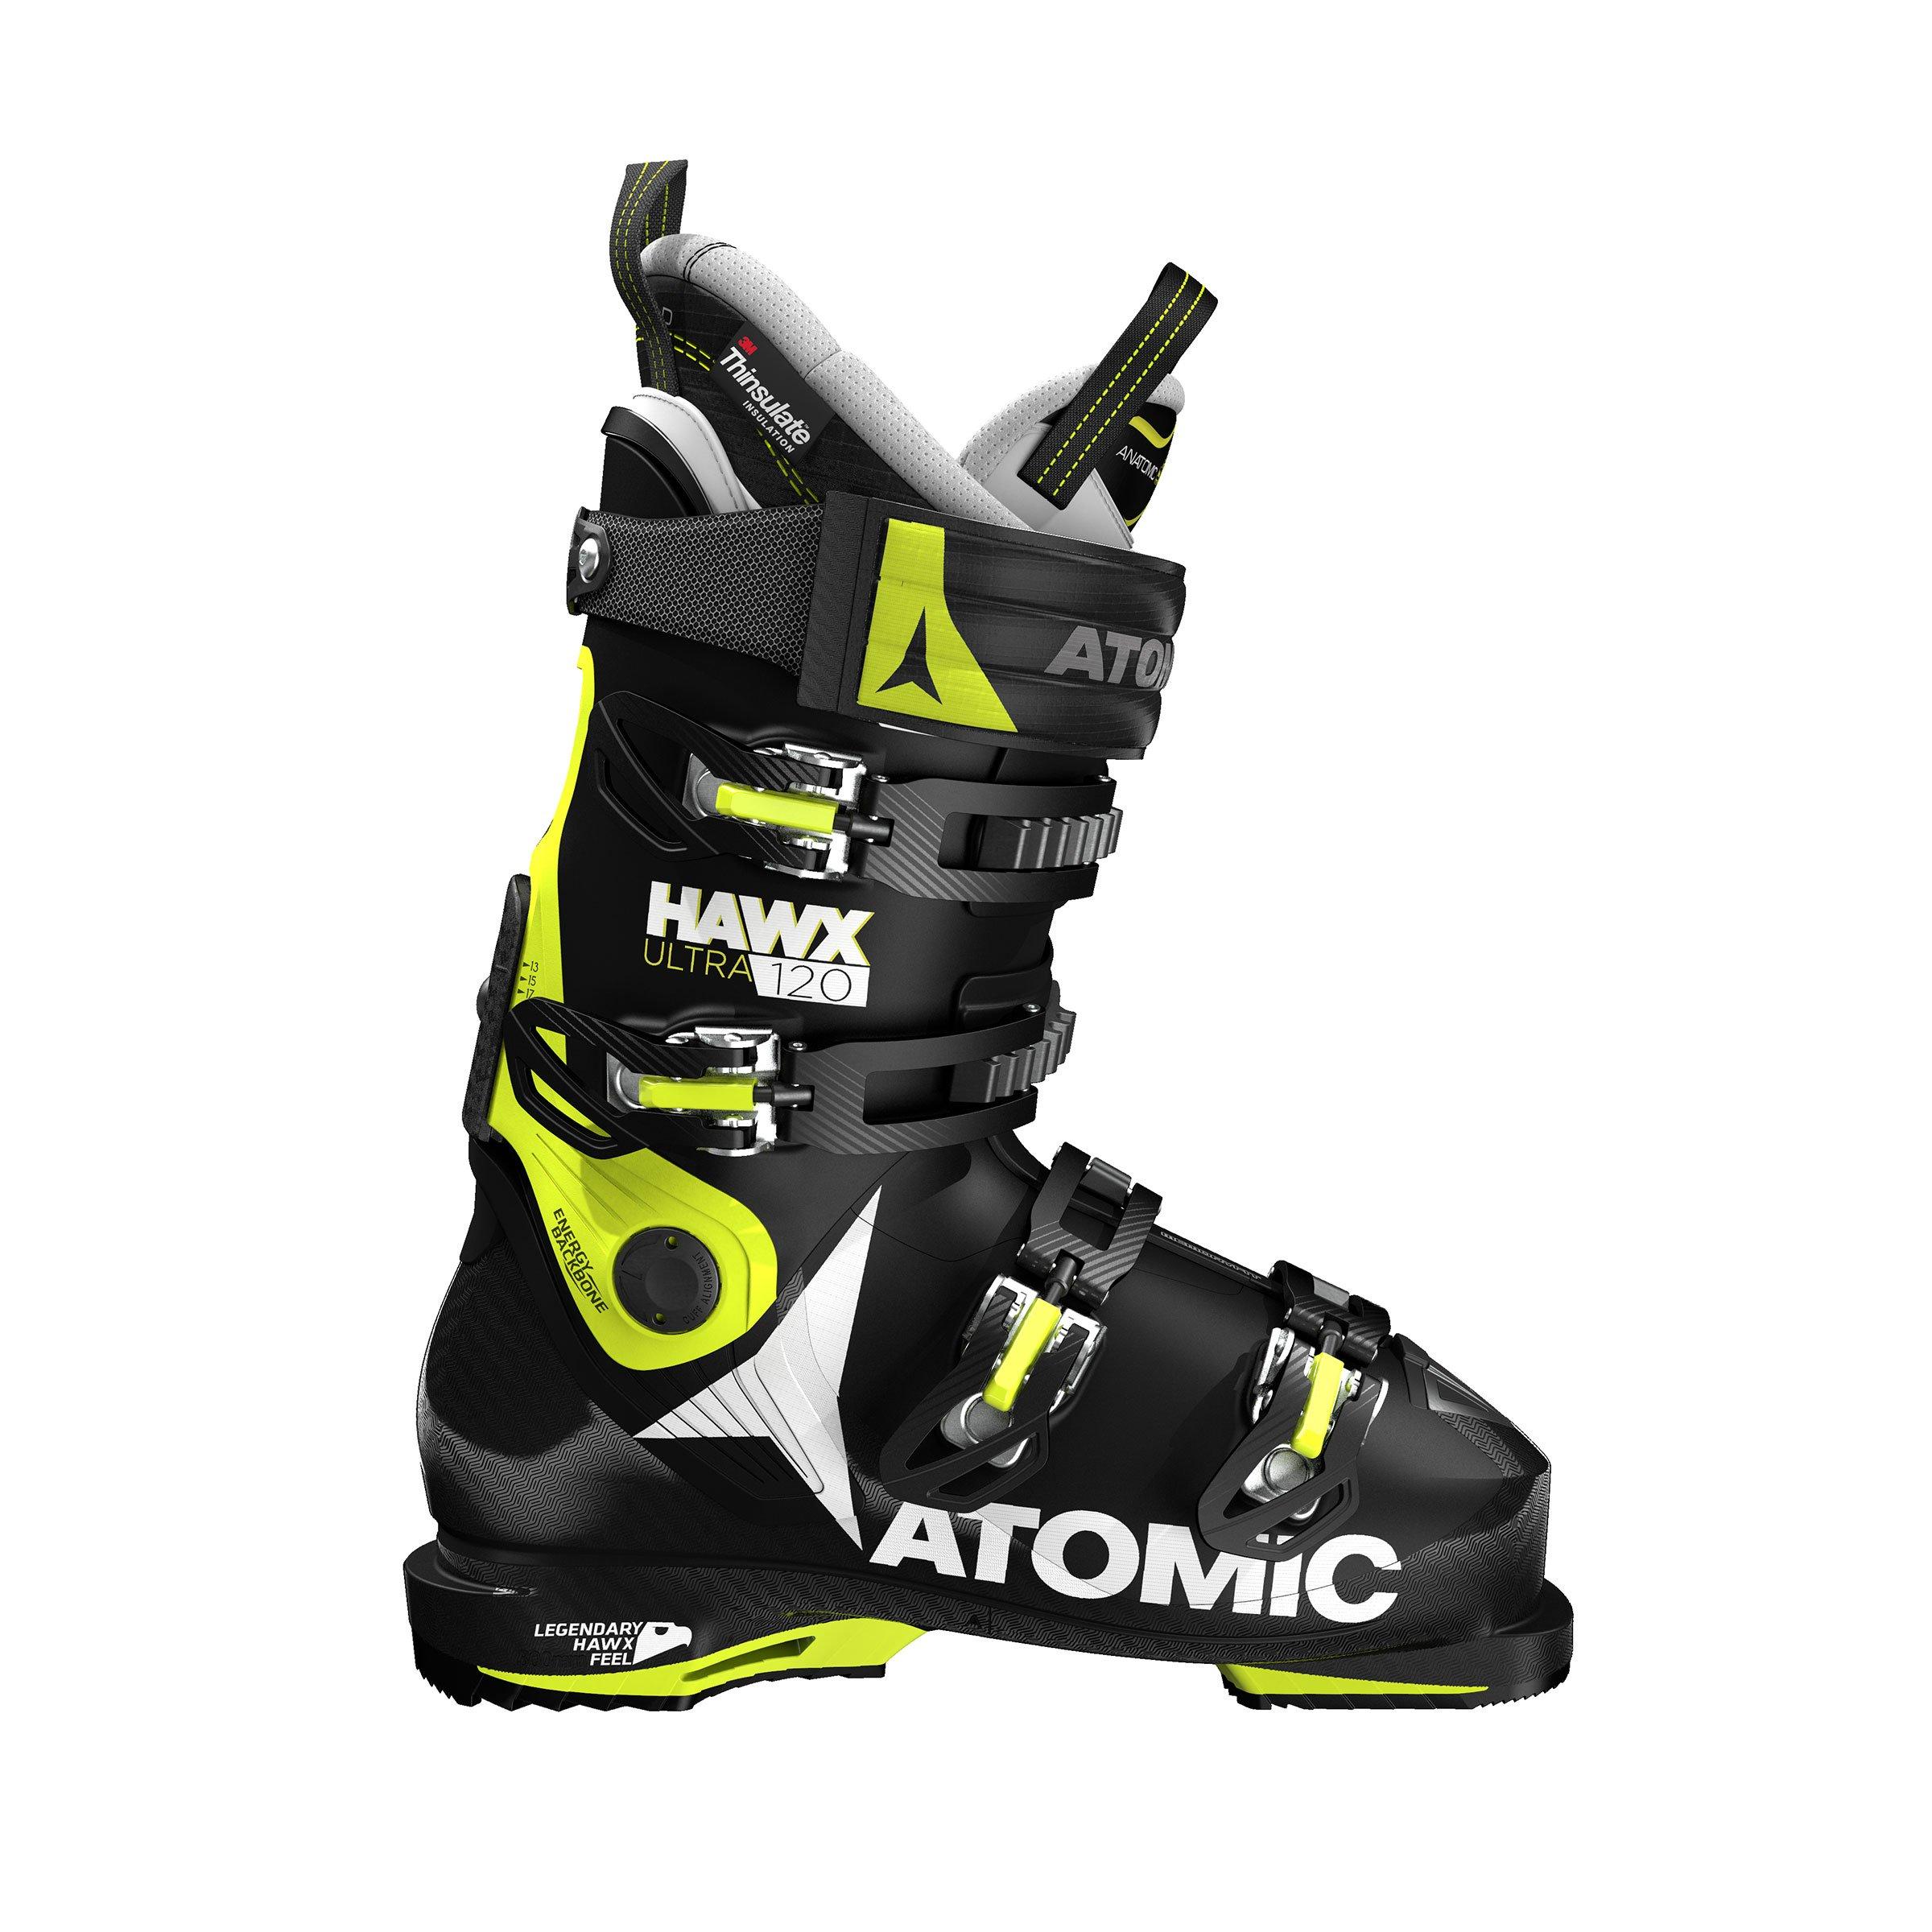 Atomic Hawx Ultra 120 16/17